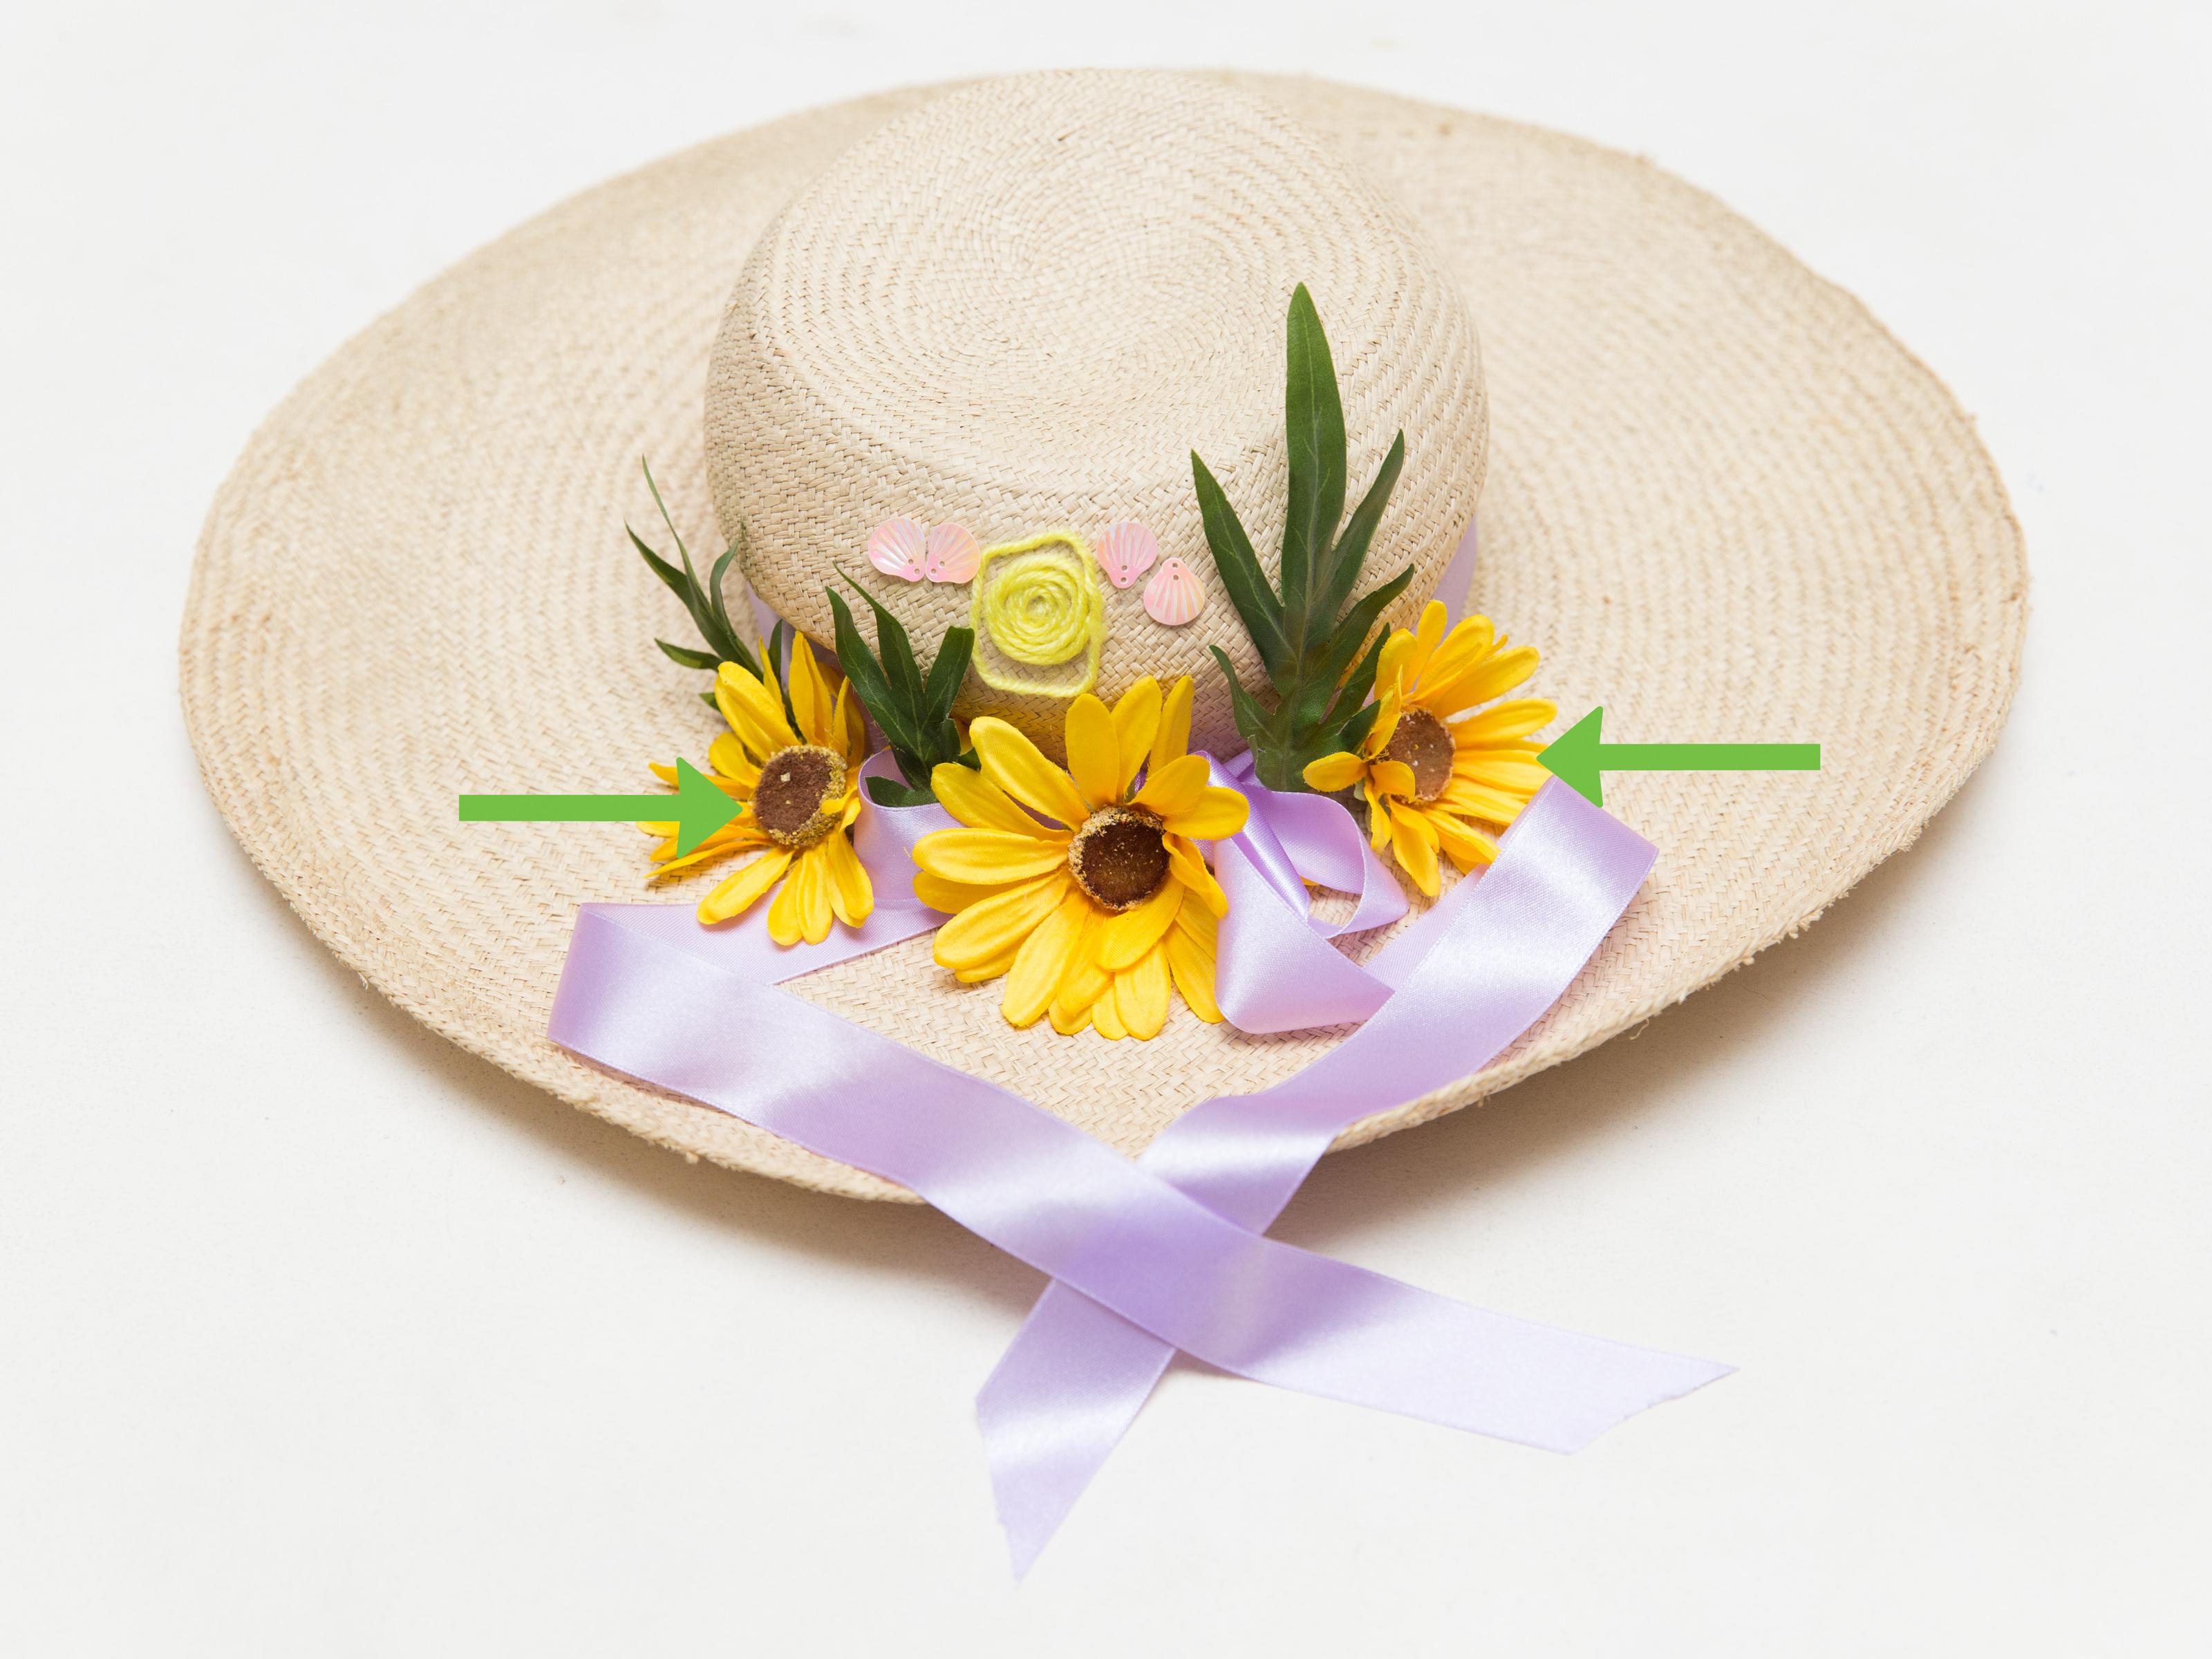 Fresh Flowers Decorating Hats